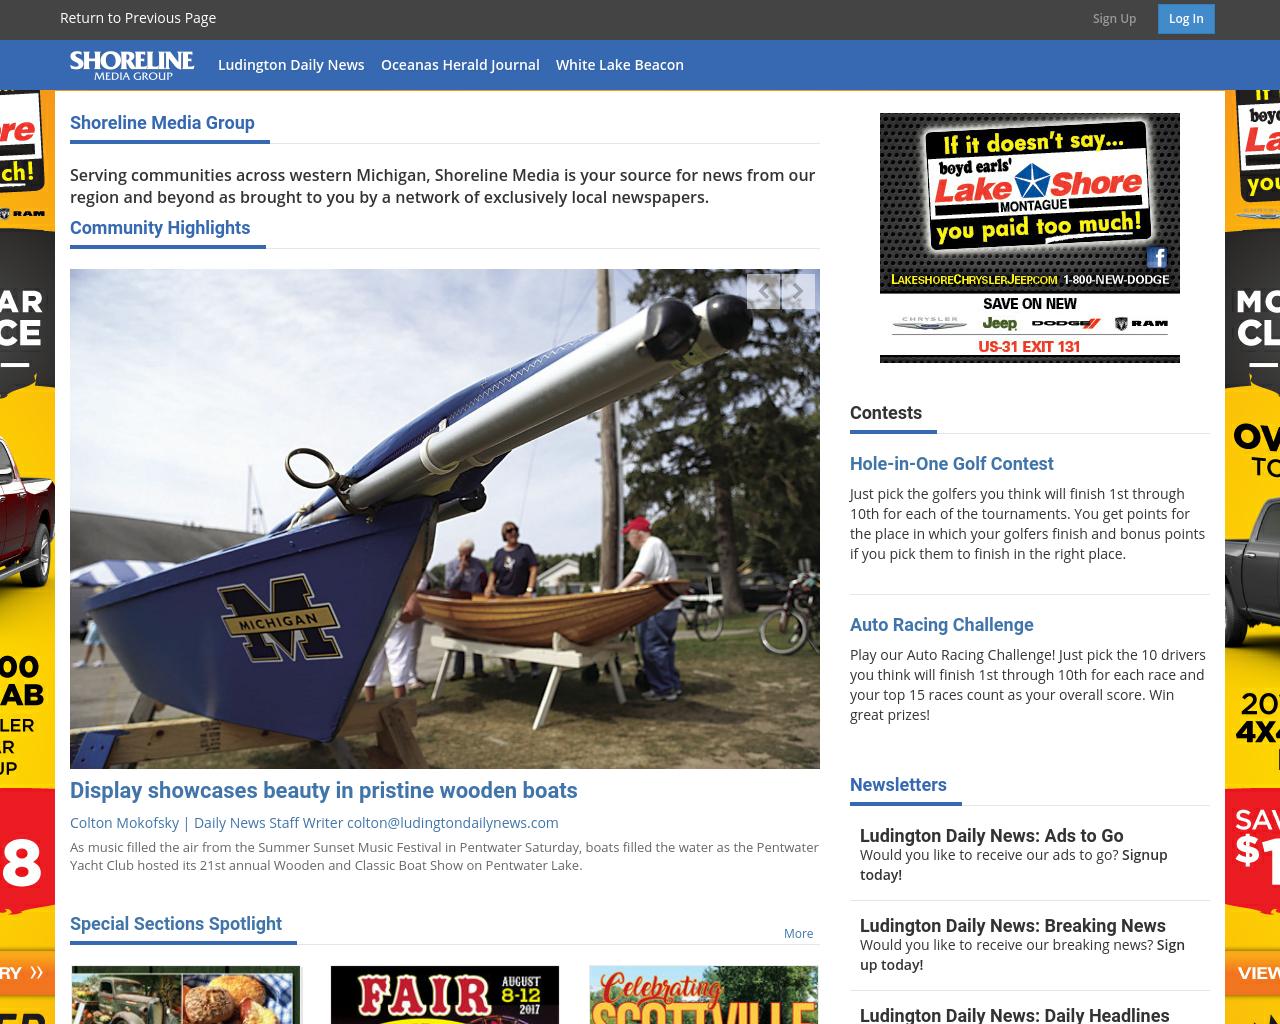 Shoreline-Media-Group-Advertising-Reviews-Pricing